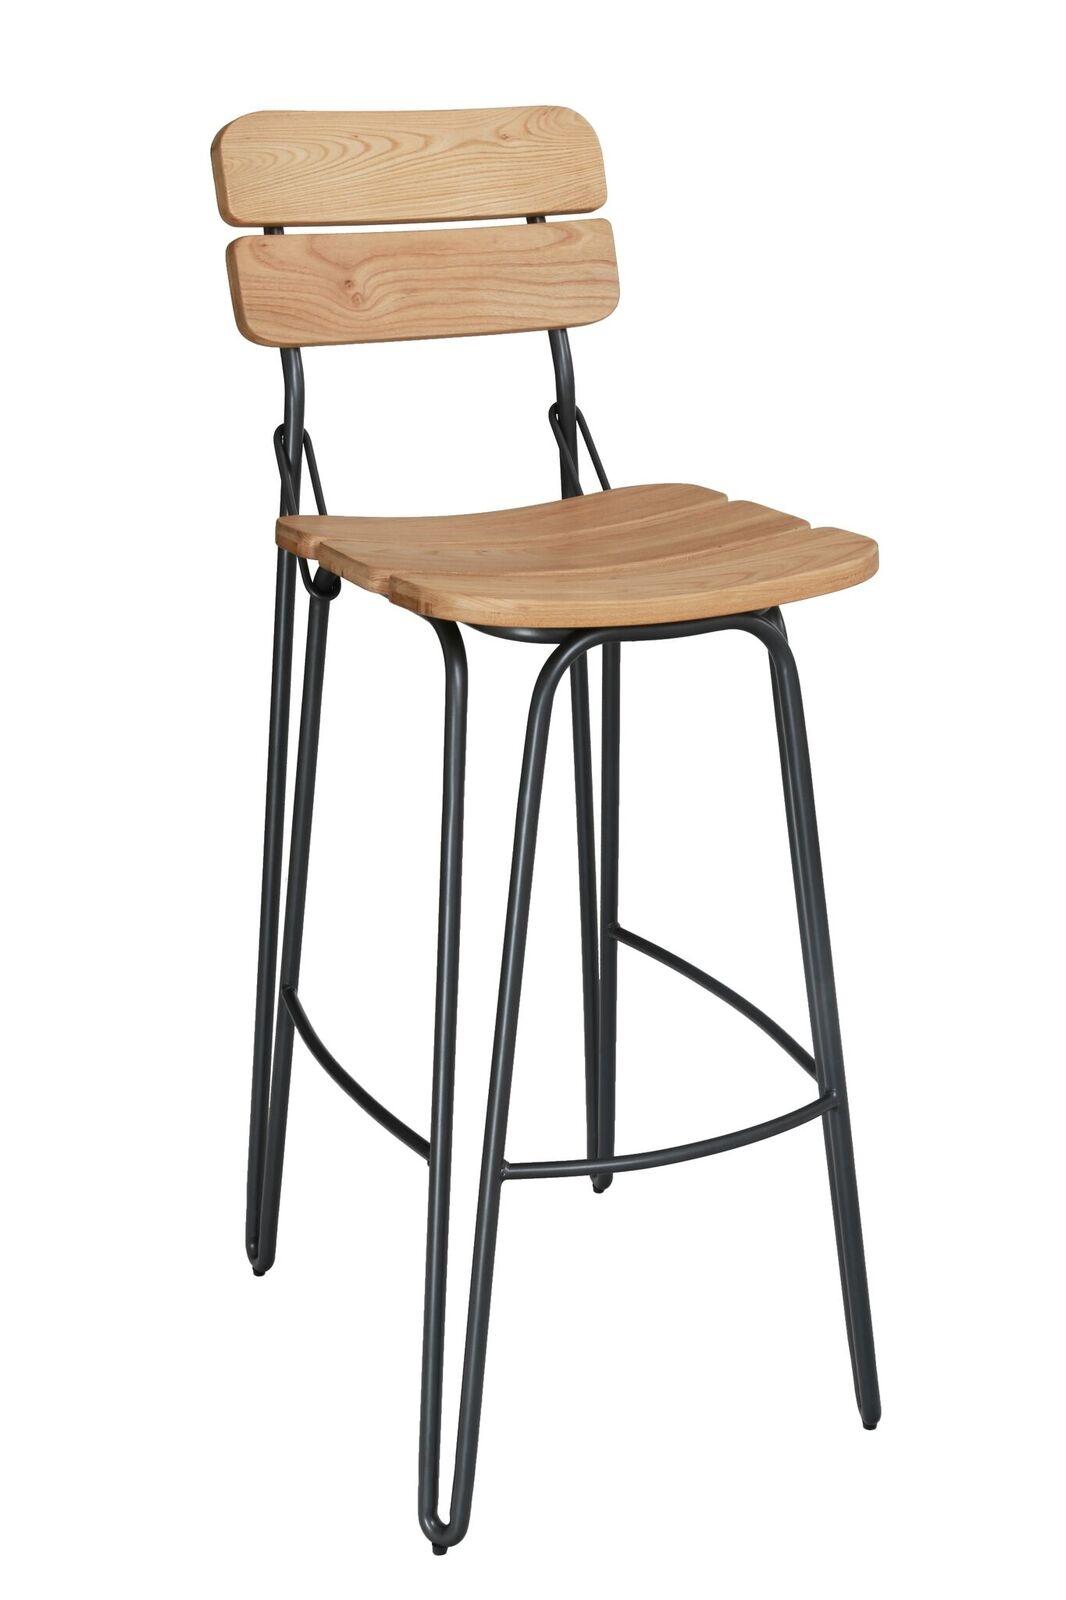 Set 2 scaune de bar din lemn de ulm cu picioare metalice Delta Natural l39xA51xH93 cm